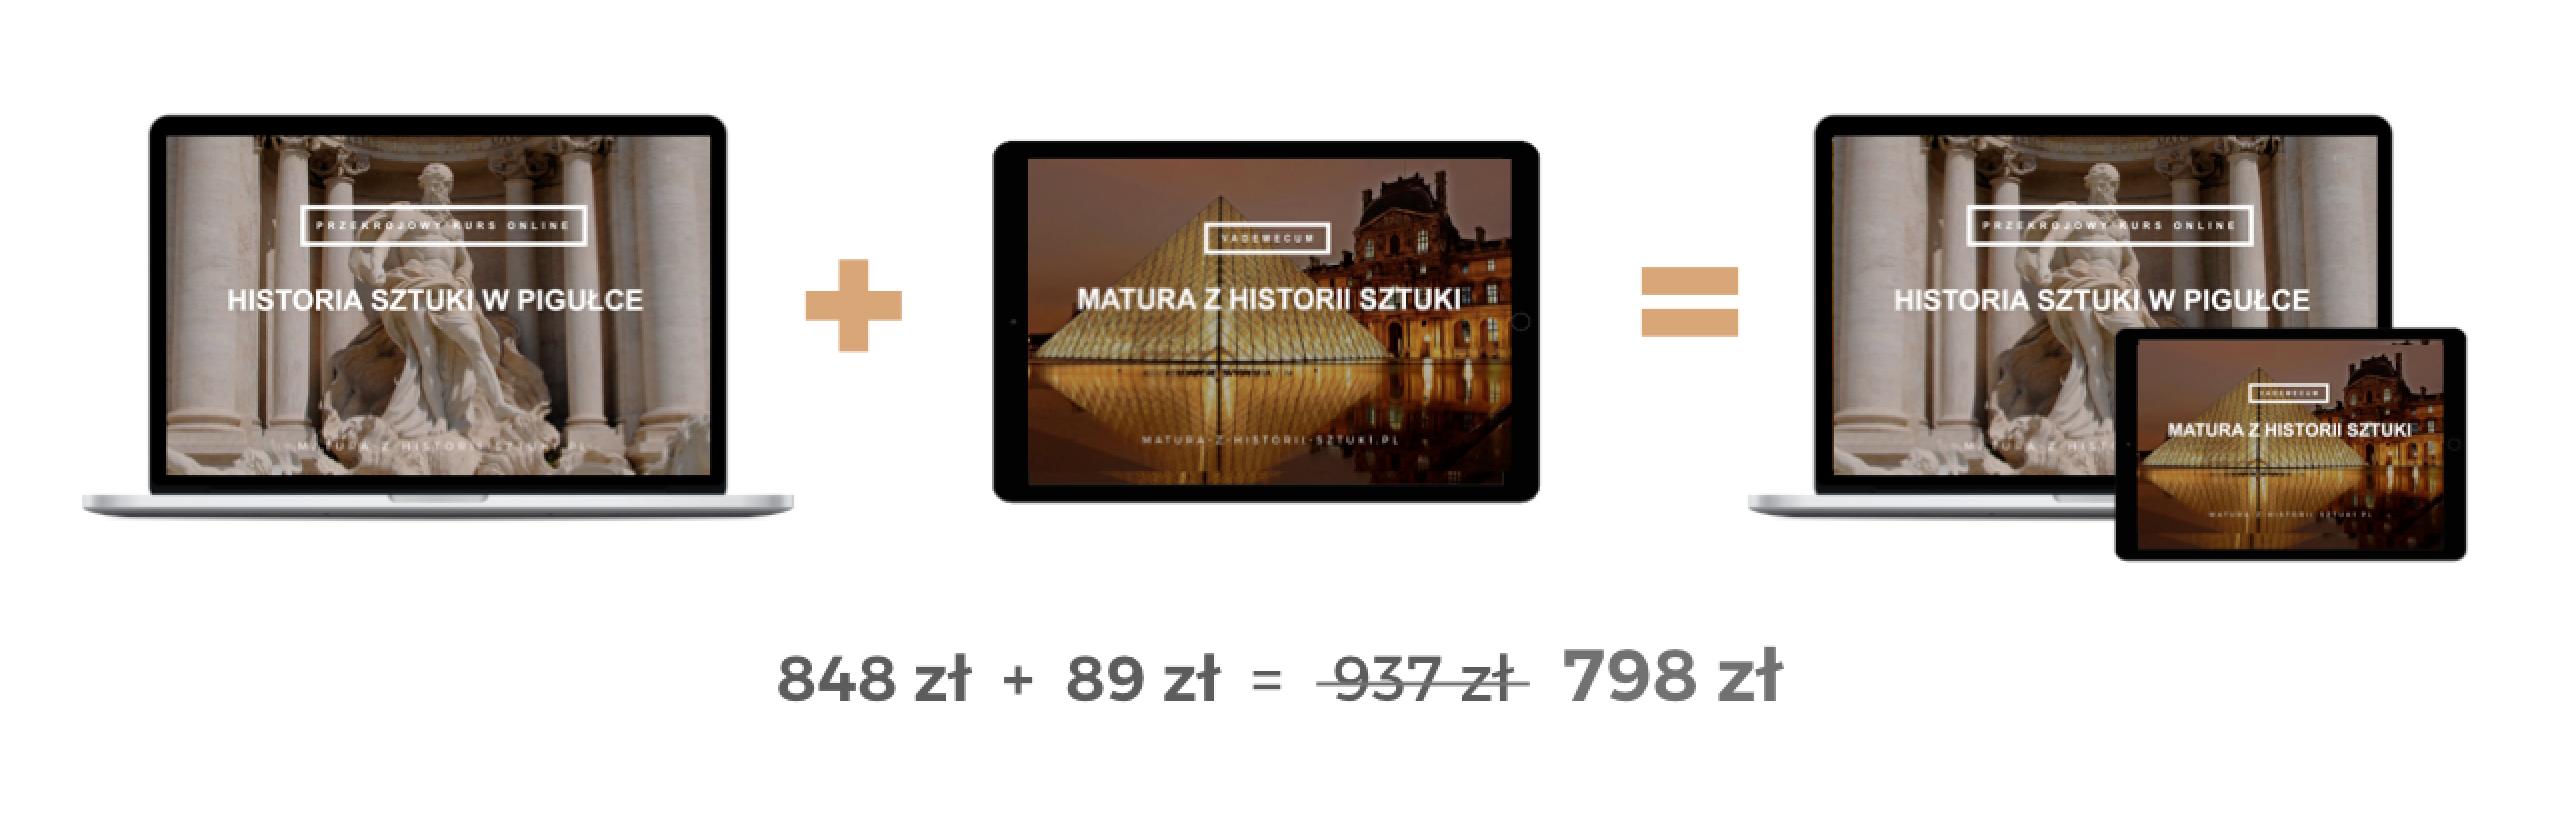 "Kurs ""Historia sztuki w pigułce"" - cena"